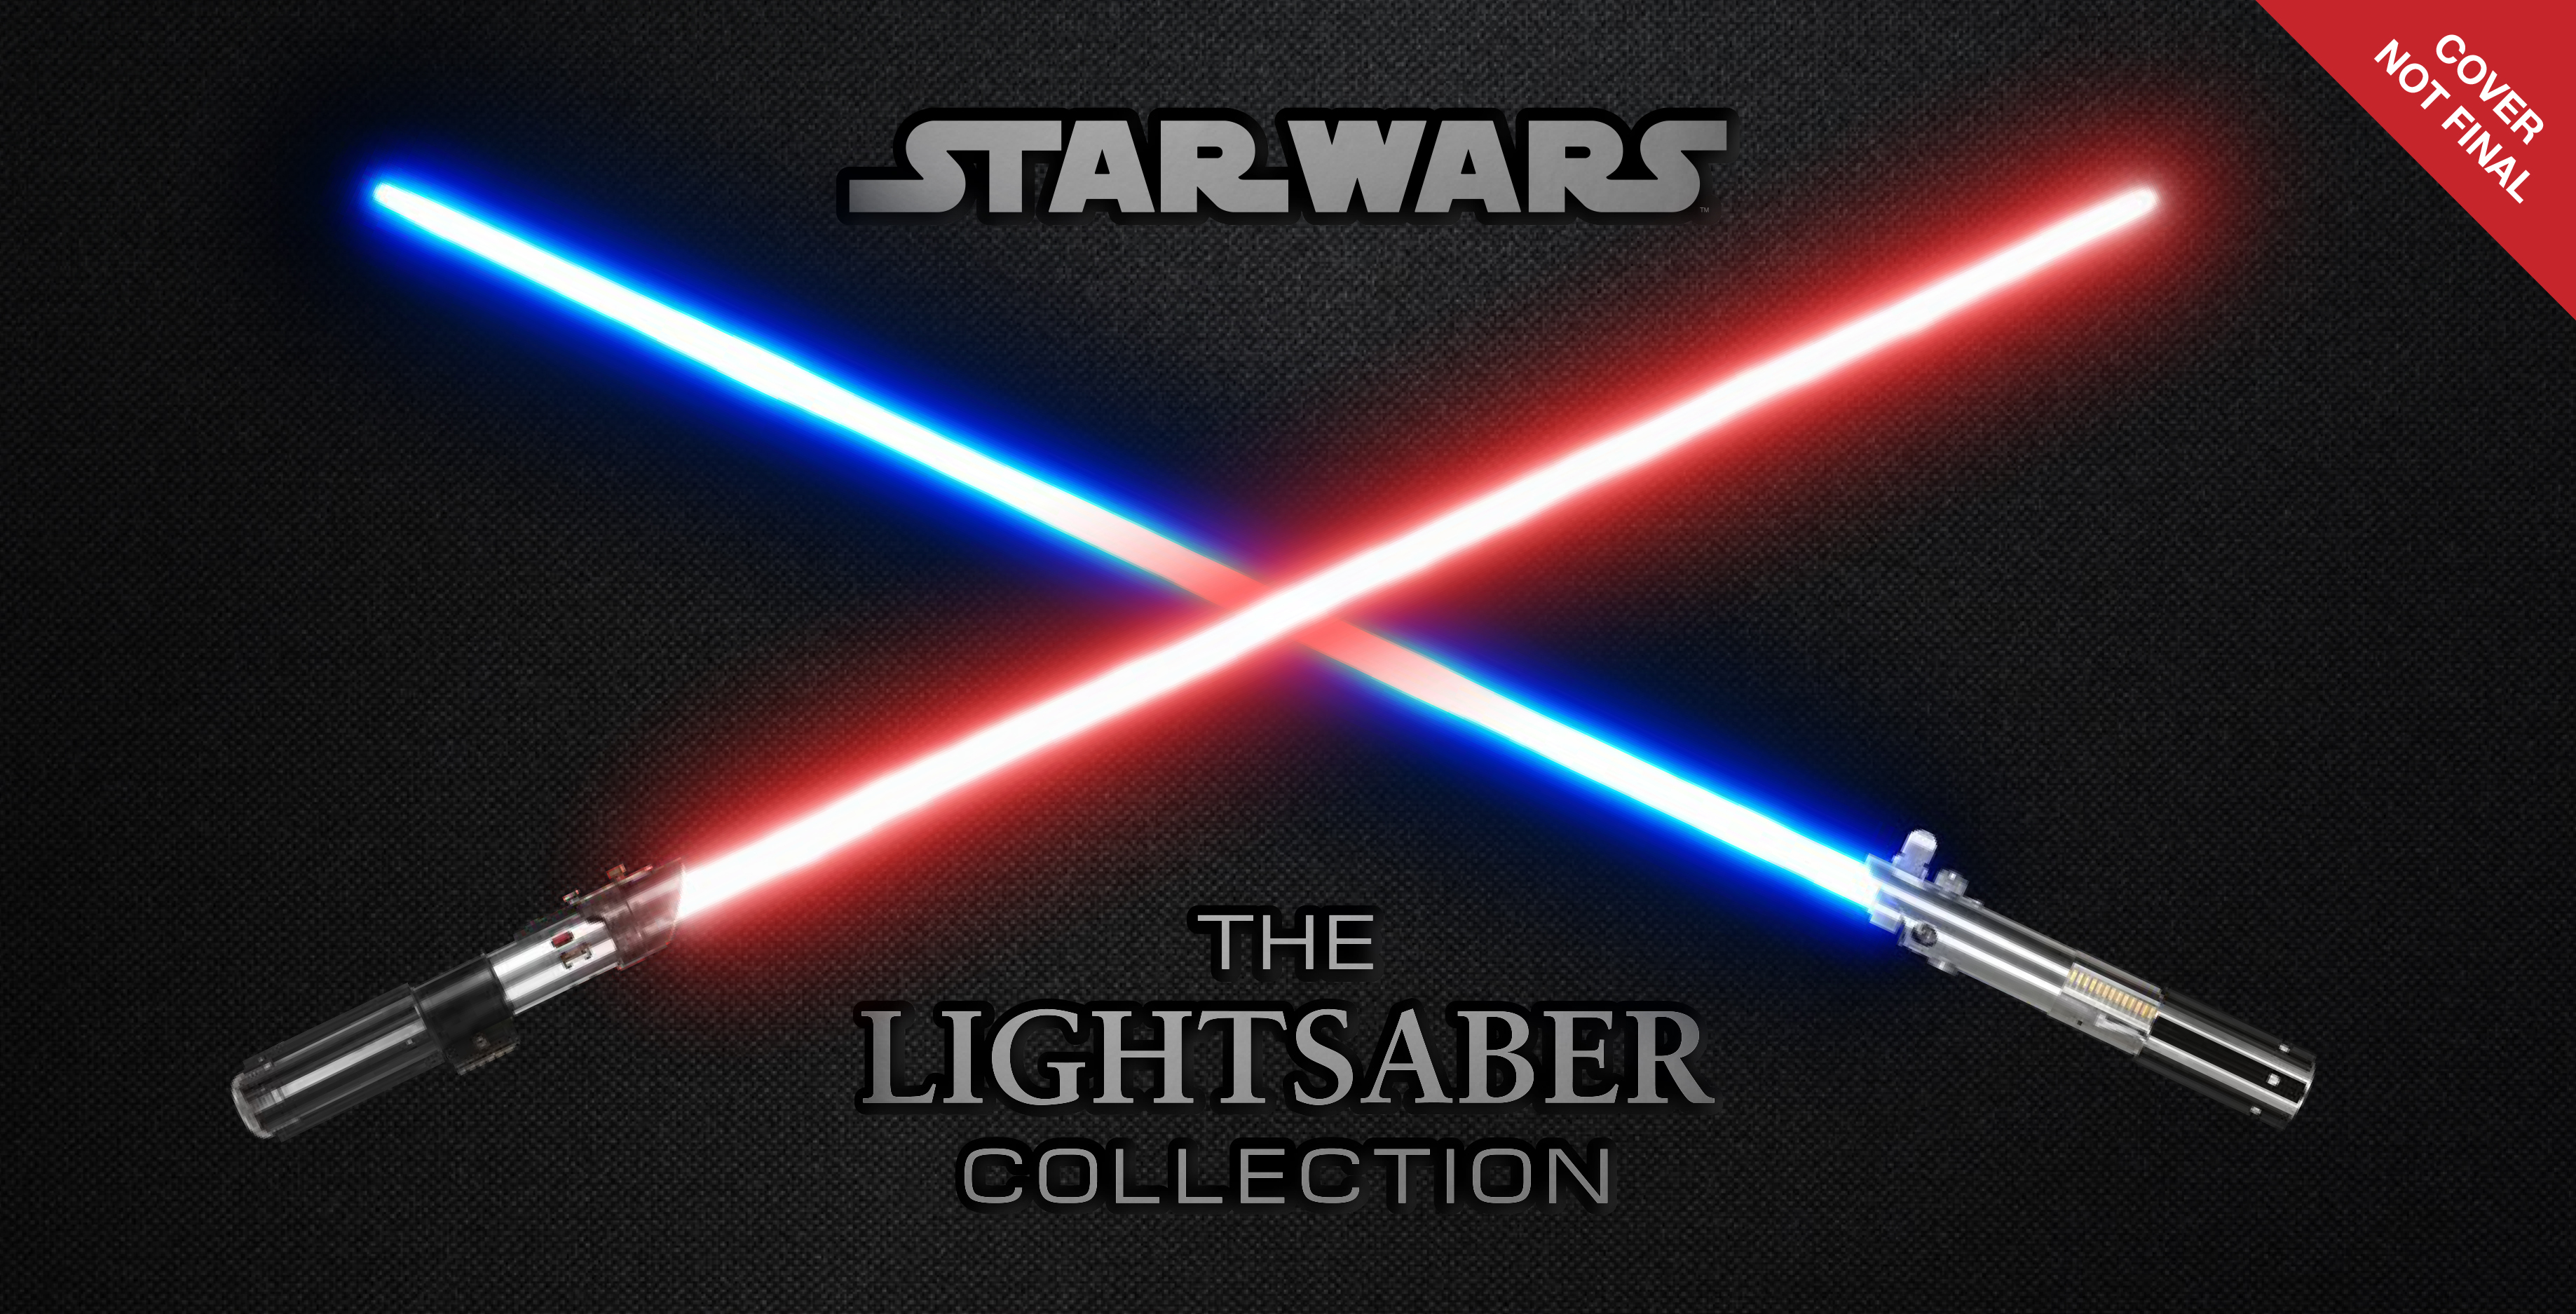 star wars lightsaber book